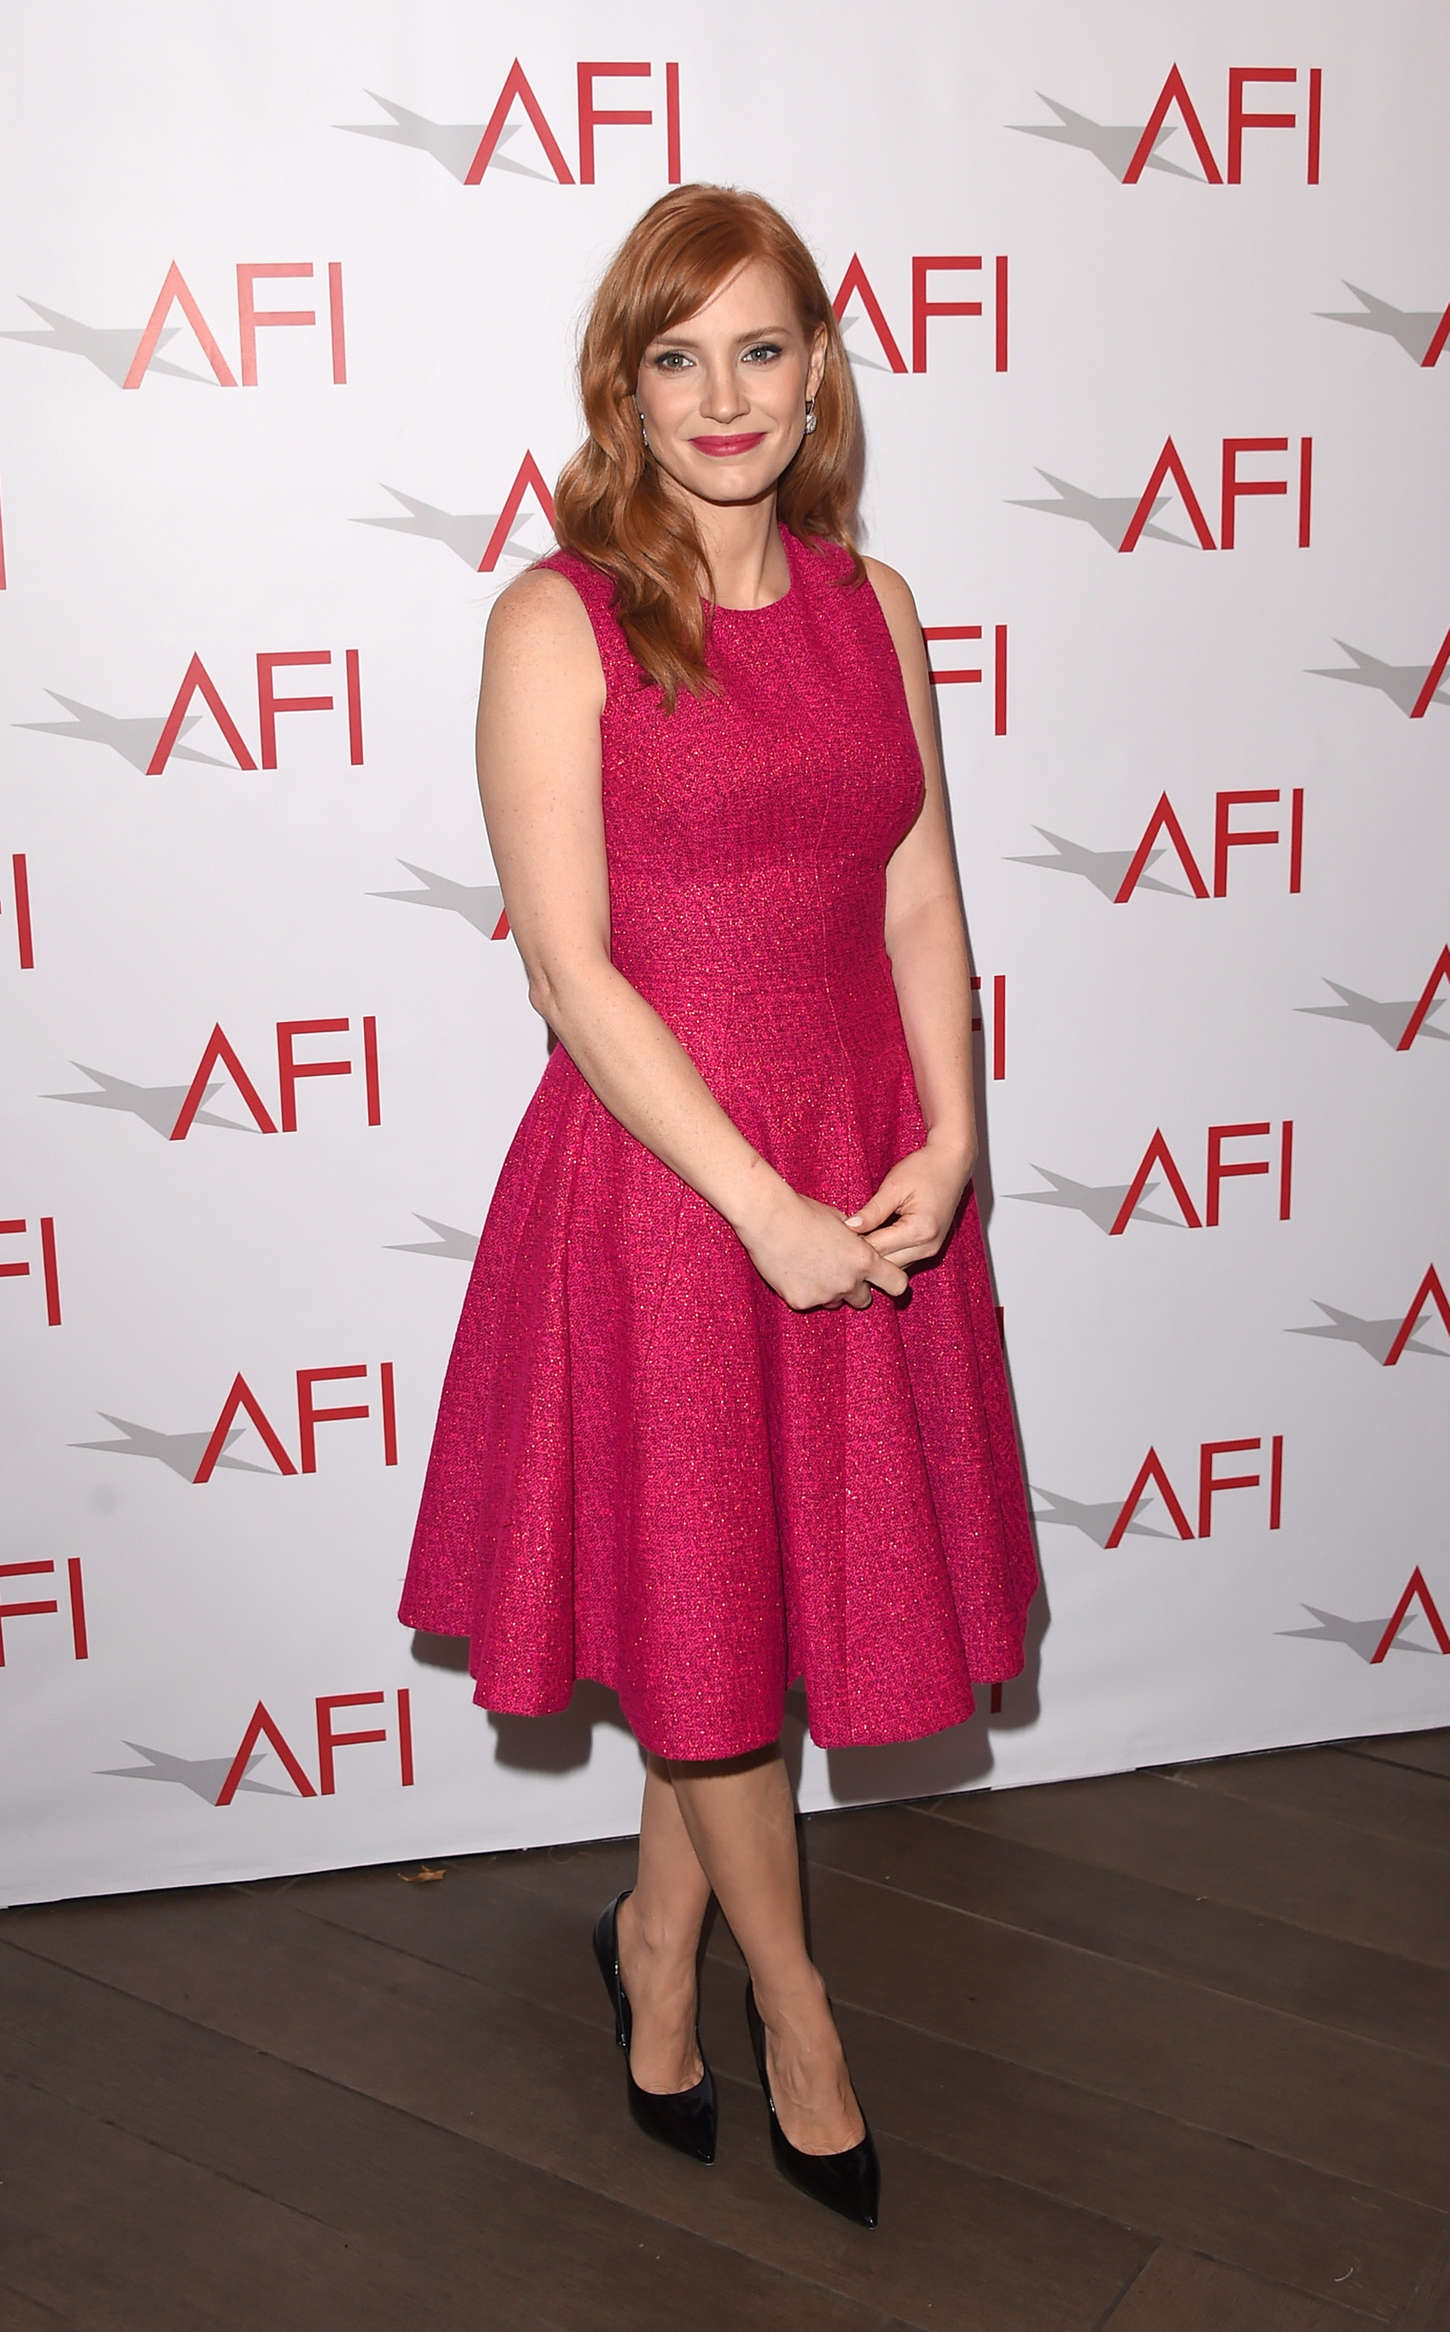 Jessica Chastain 2015 : Jessica Chastain: 2015 AFI Awards -07